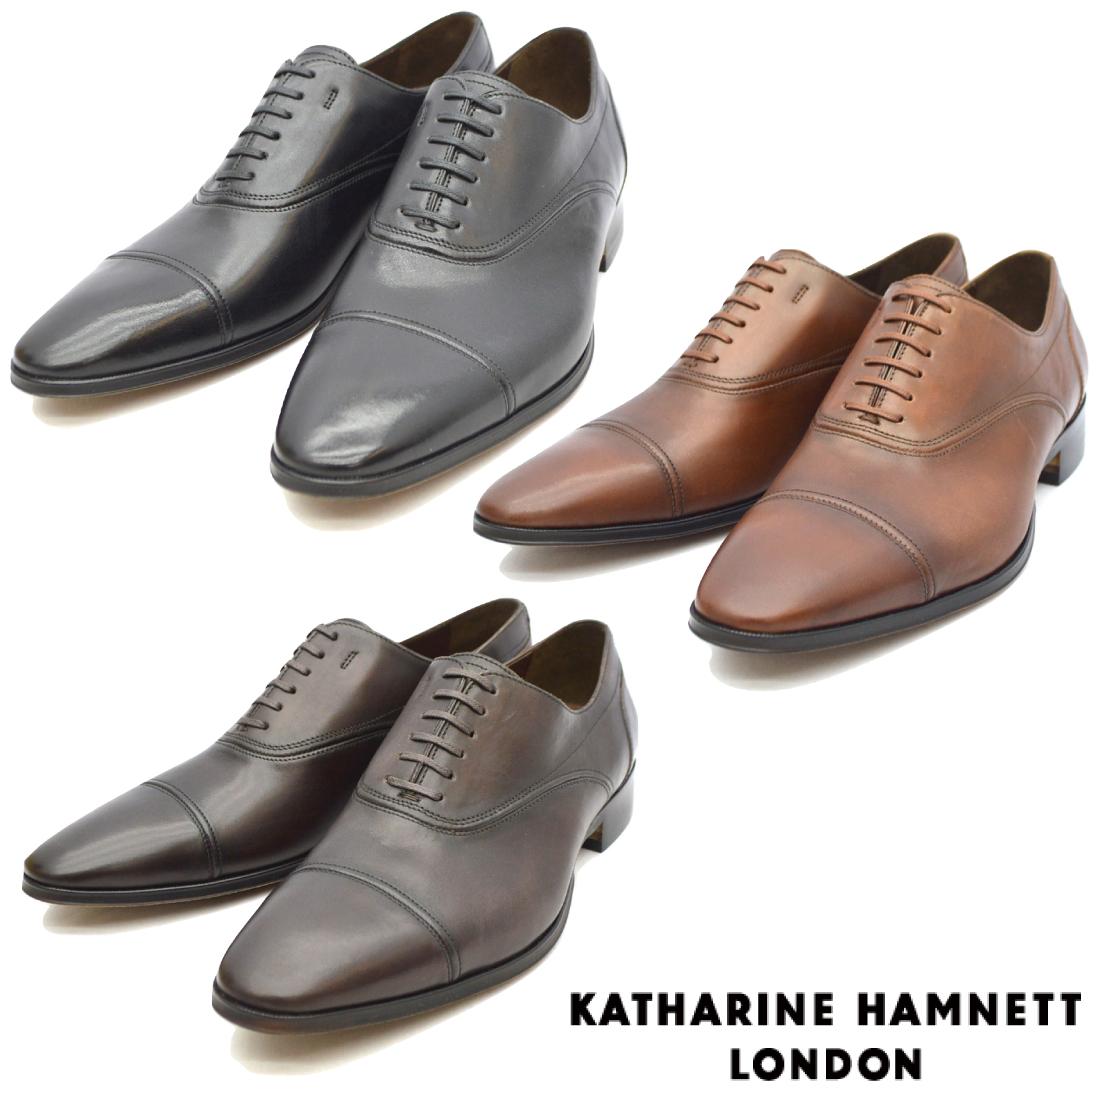 KATHARINE HAMNETT キャサリンハムネット ストレートチップ ビジネス シューズ 31633 紳士靴 【nesh】 【新品】